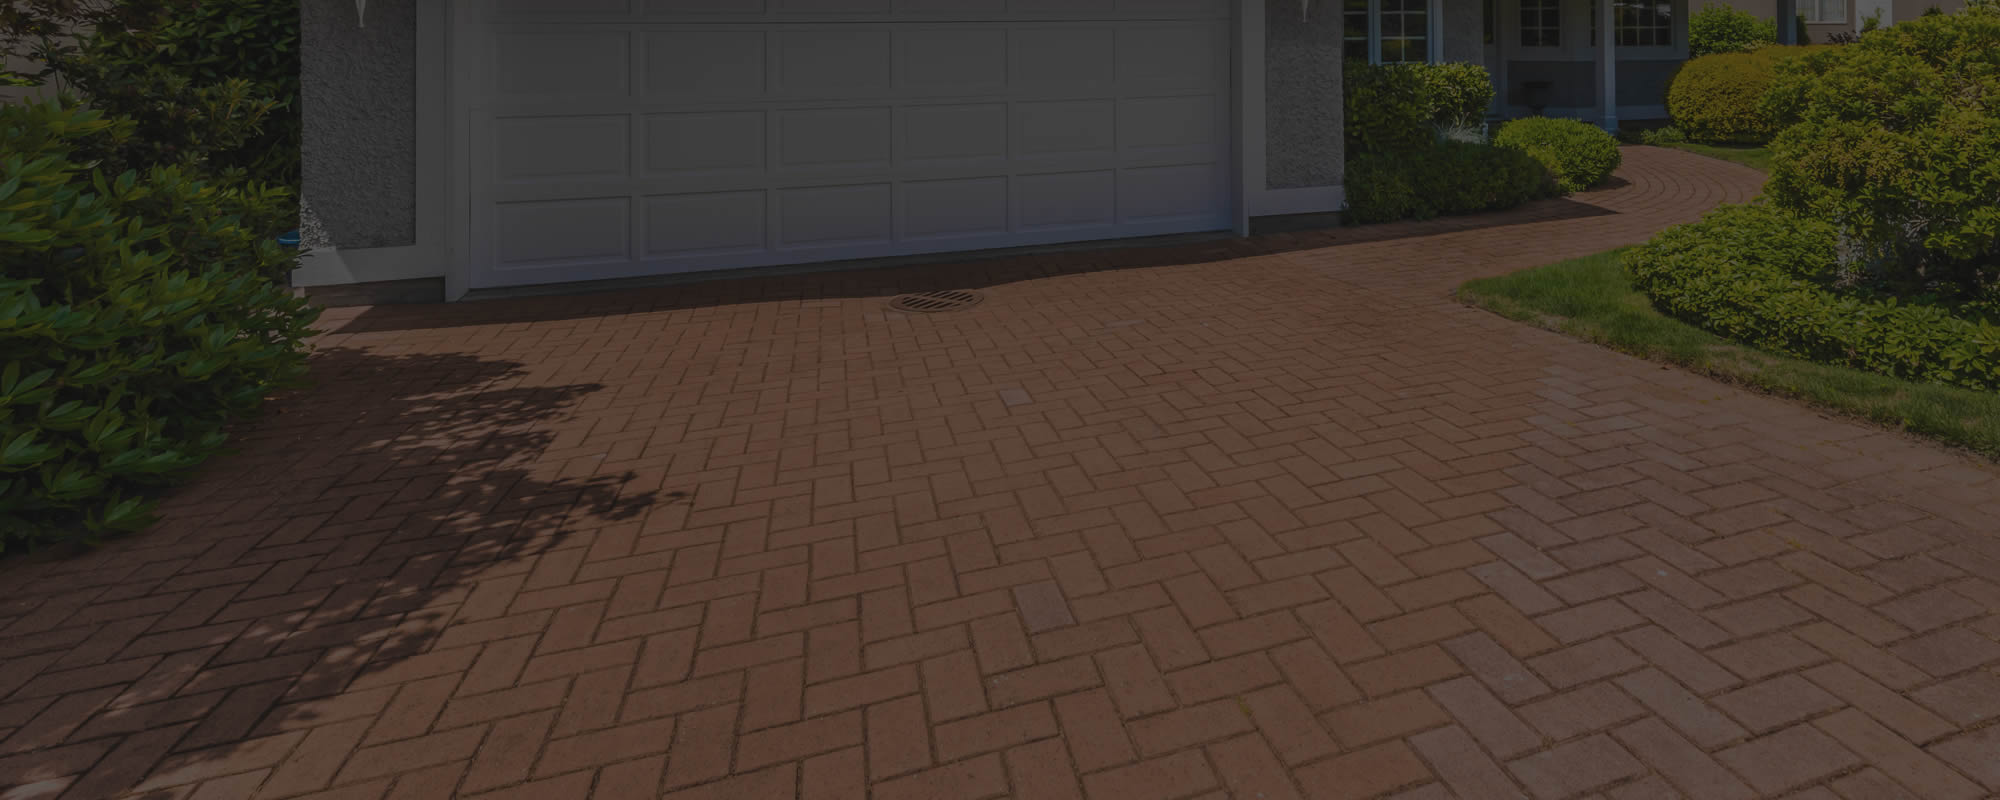 block-paved.jpg